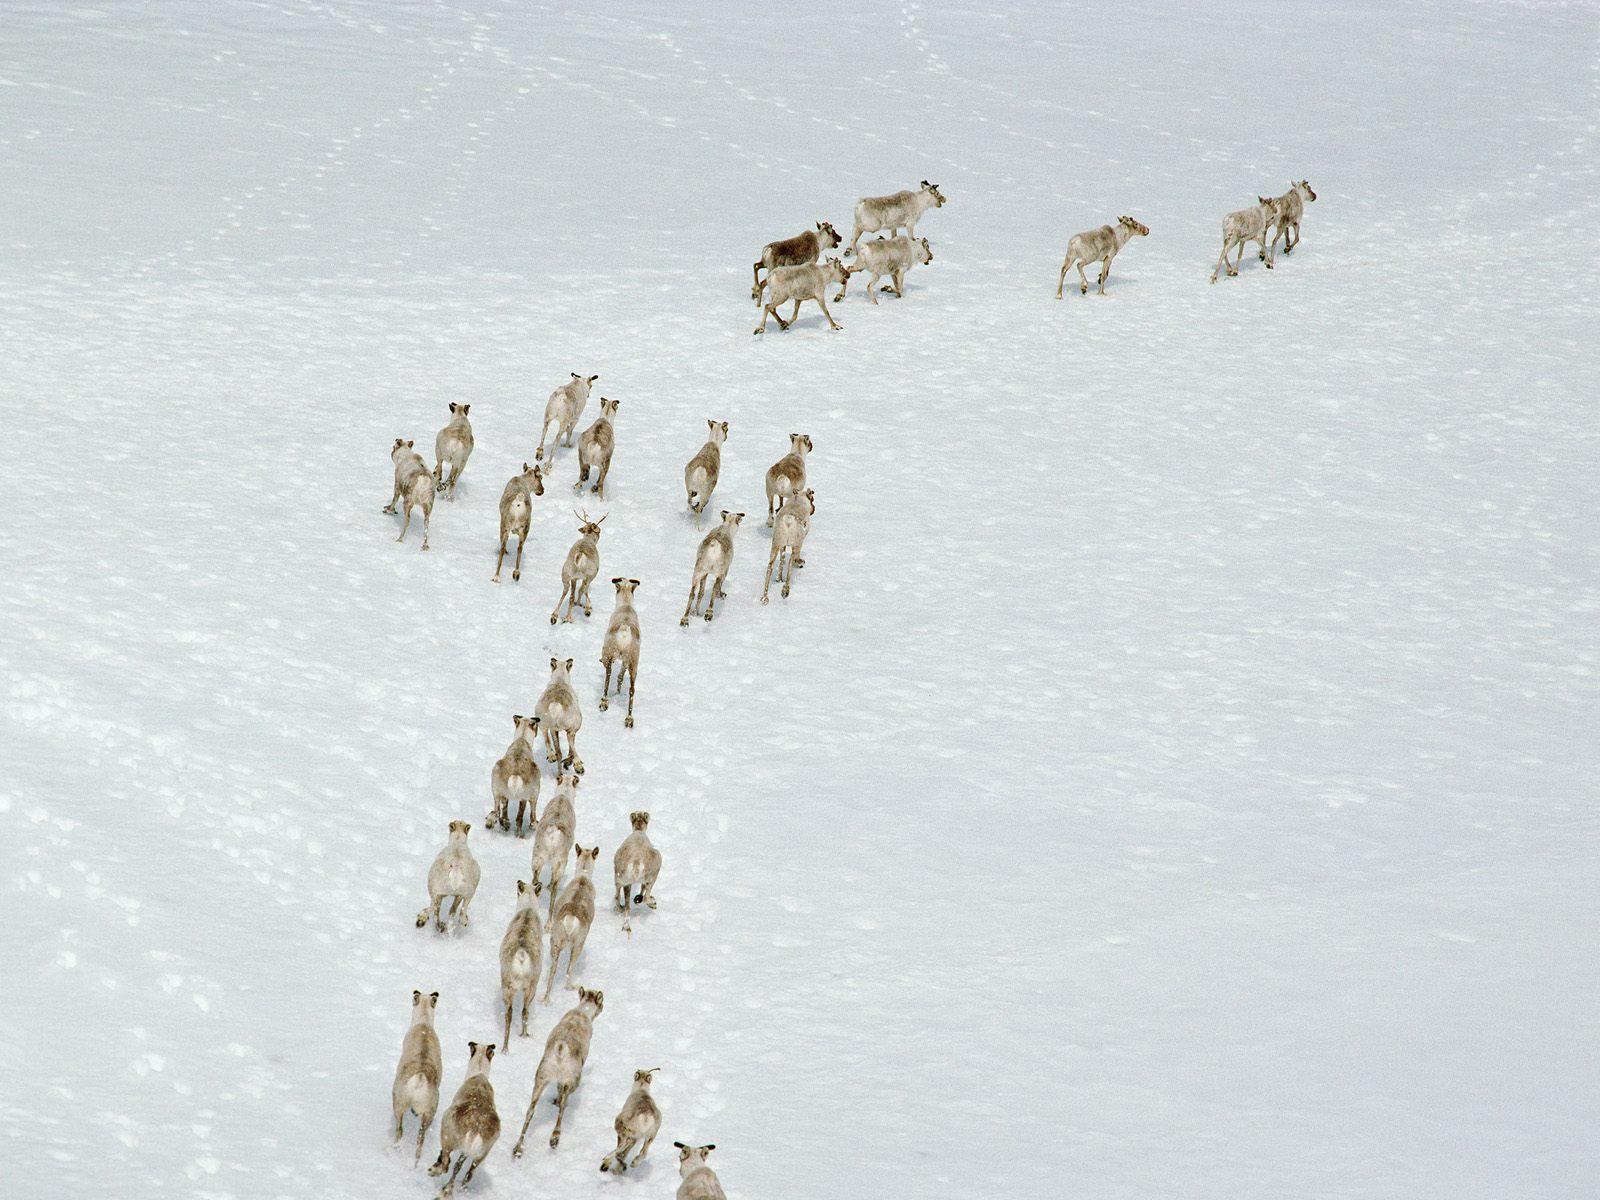 Animal - Deer  Wallpaper